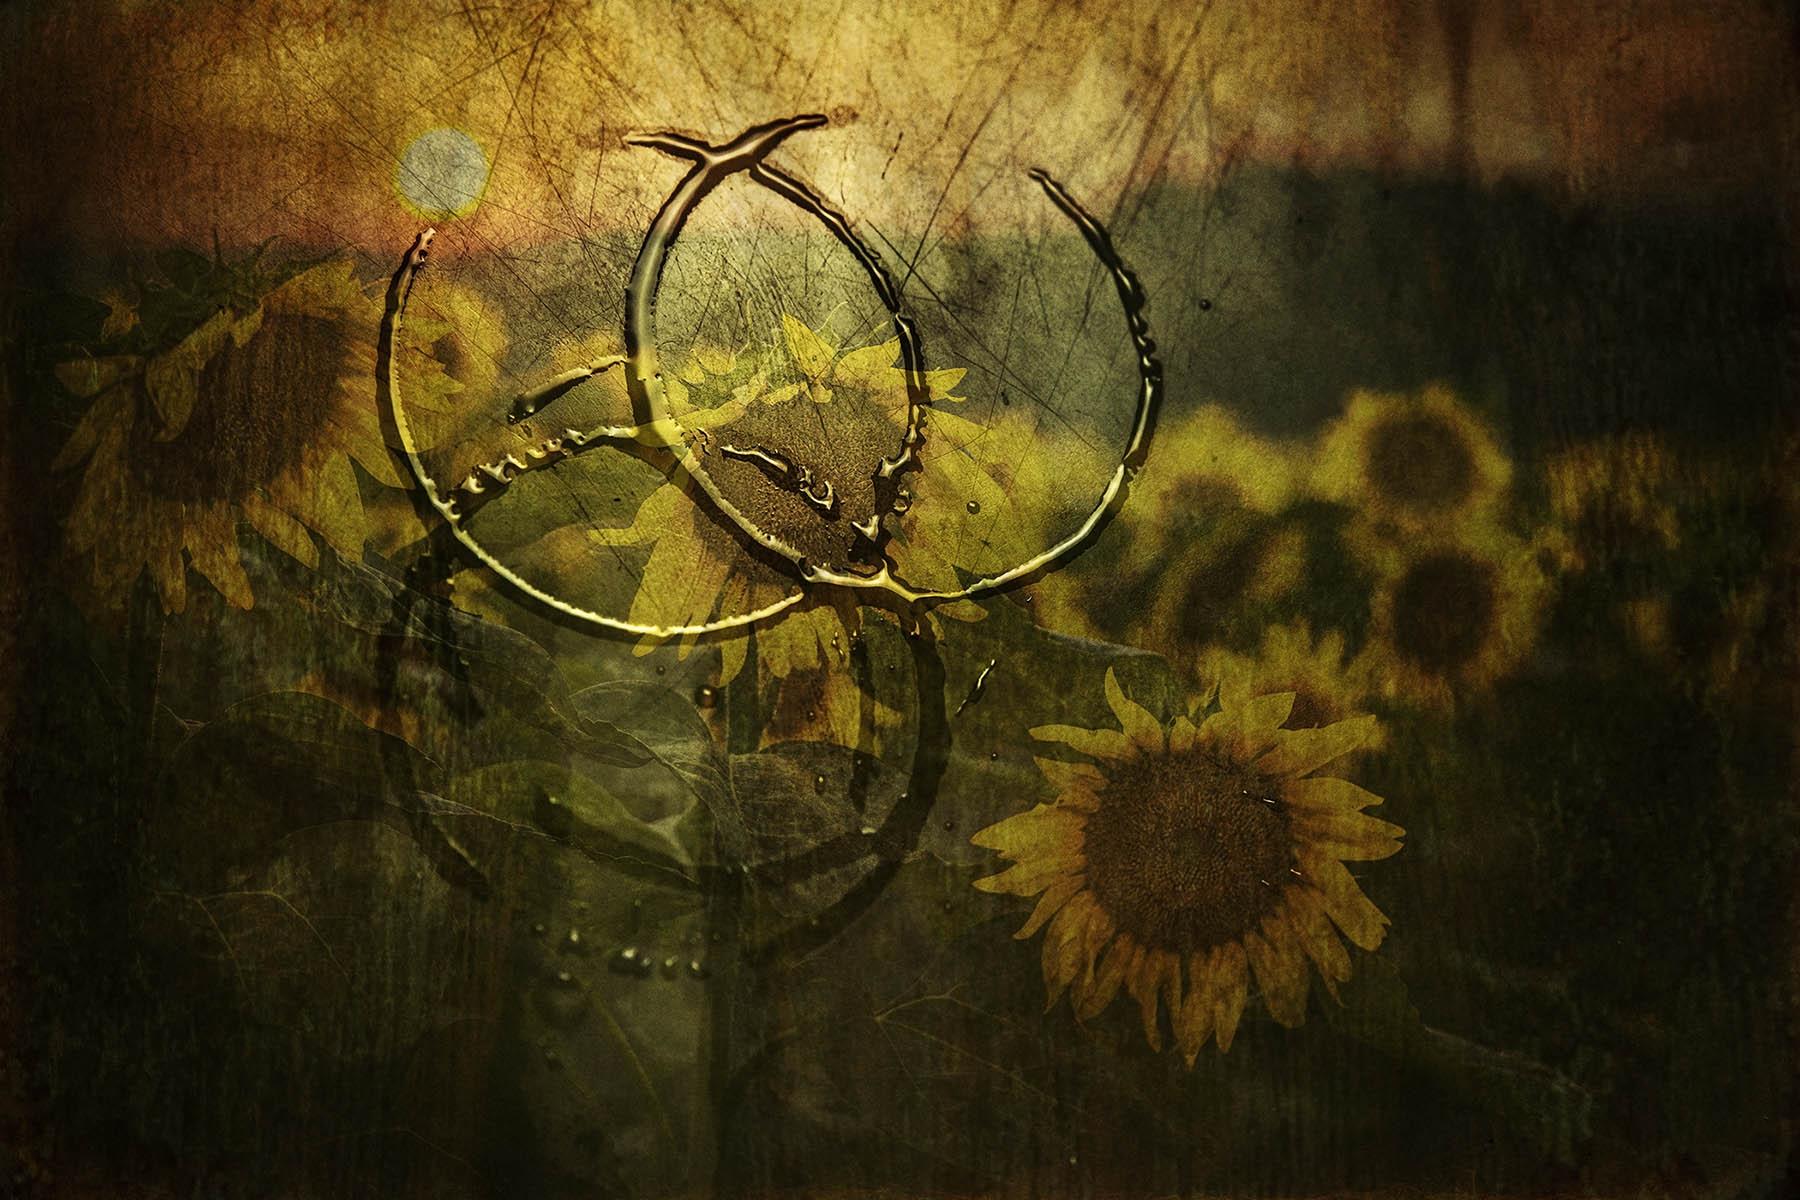 Remembering Sunflowers   Author PAUL BRACEY - PaulBracey   PHOTO FORUM